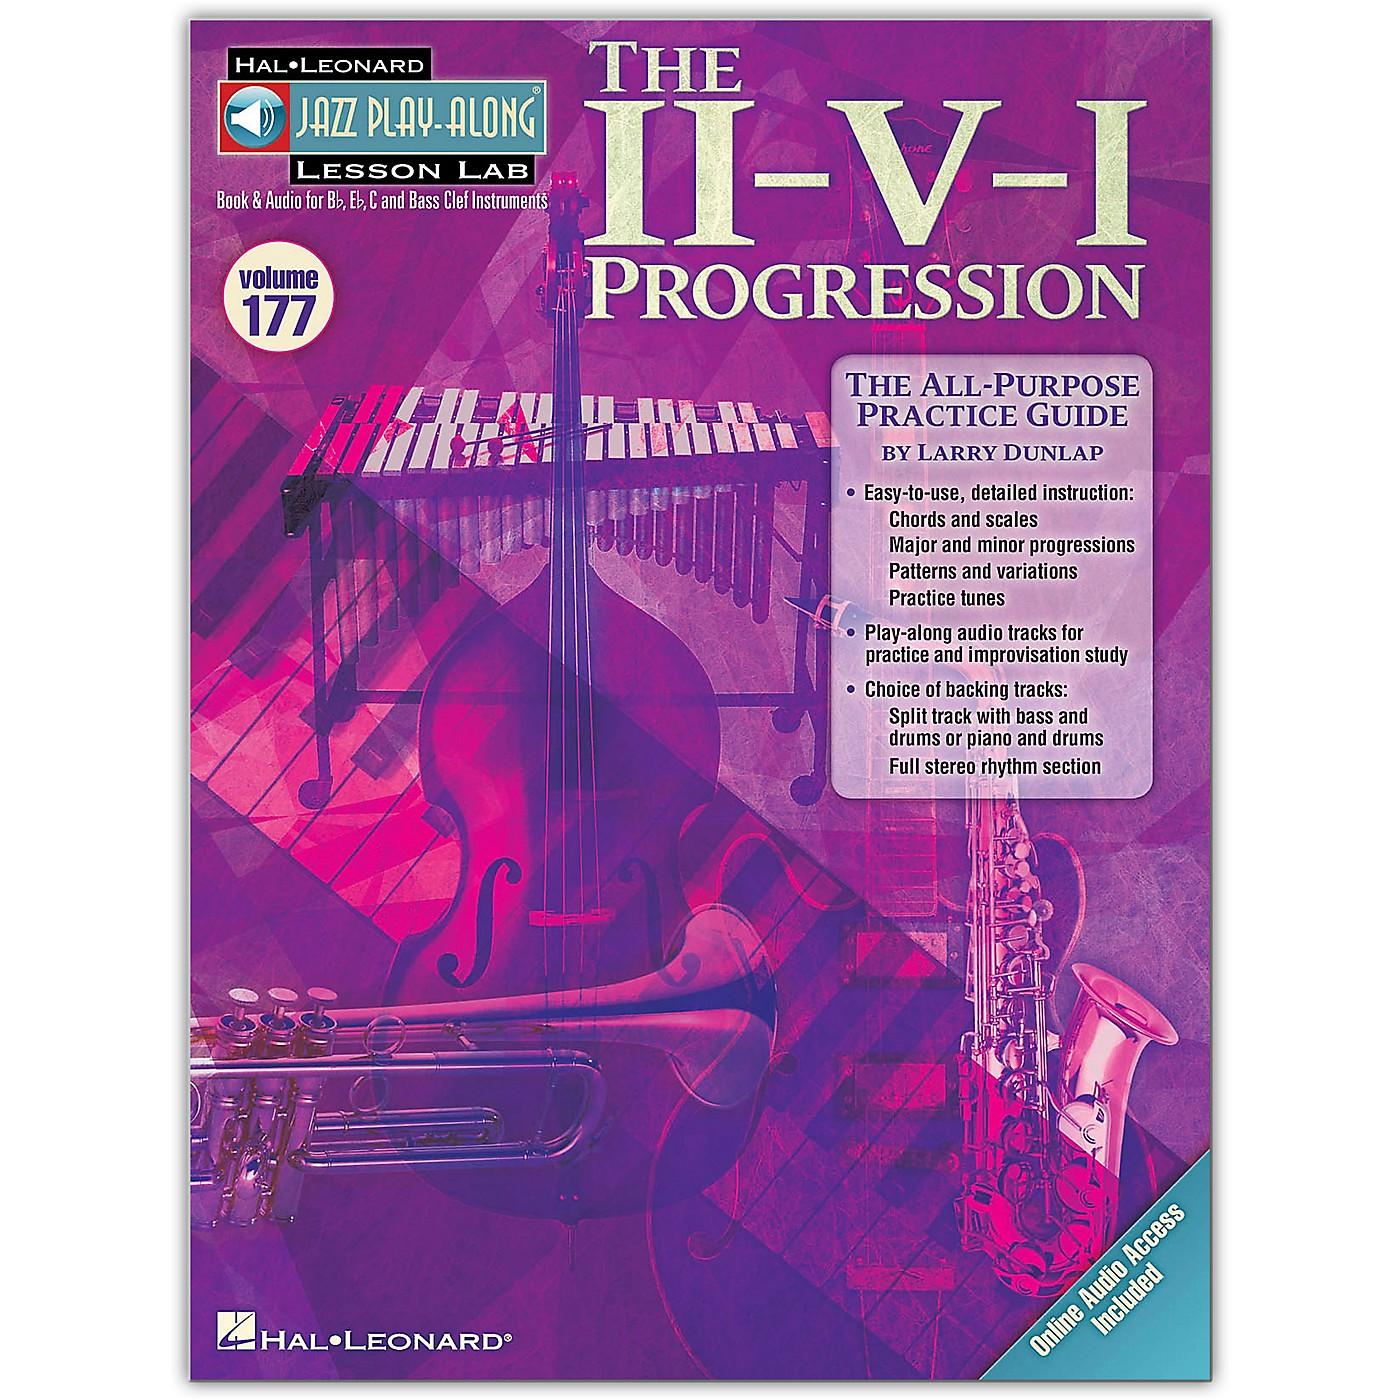 Hal Leonard The II-V-I Progression - Jazz Play-Along Lesson Lab Vol. 177 Book/Online Audio thumbnail